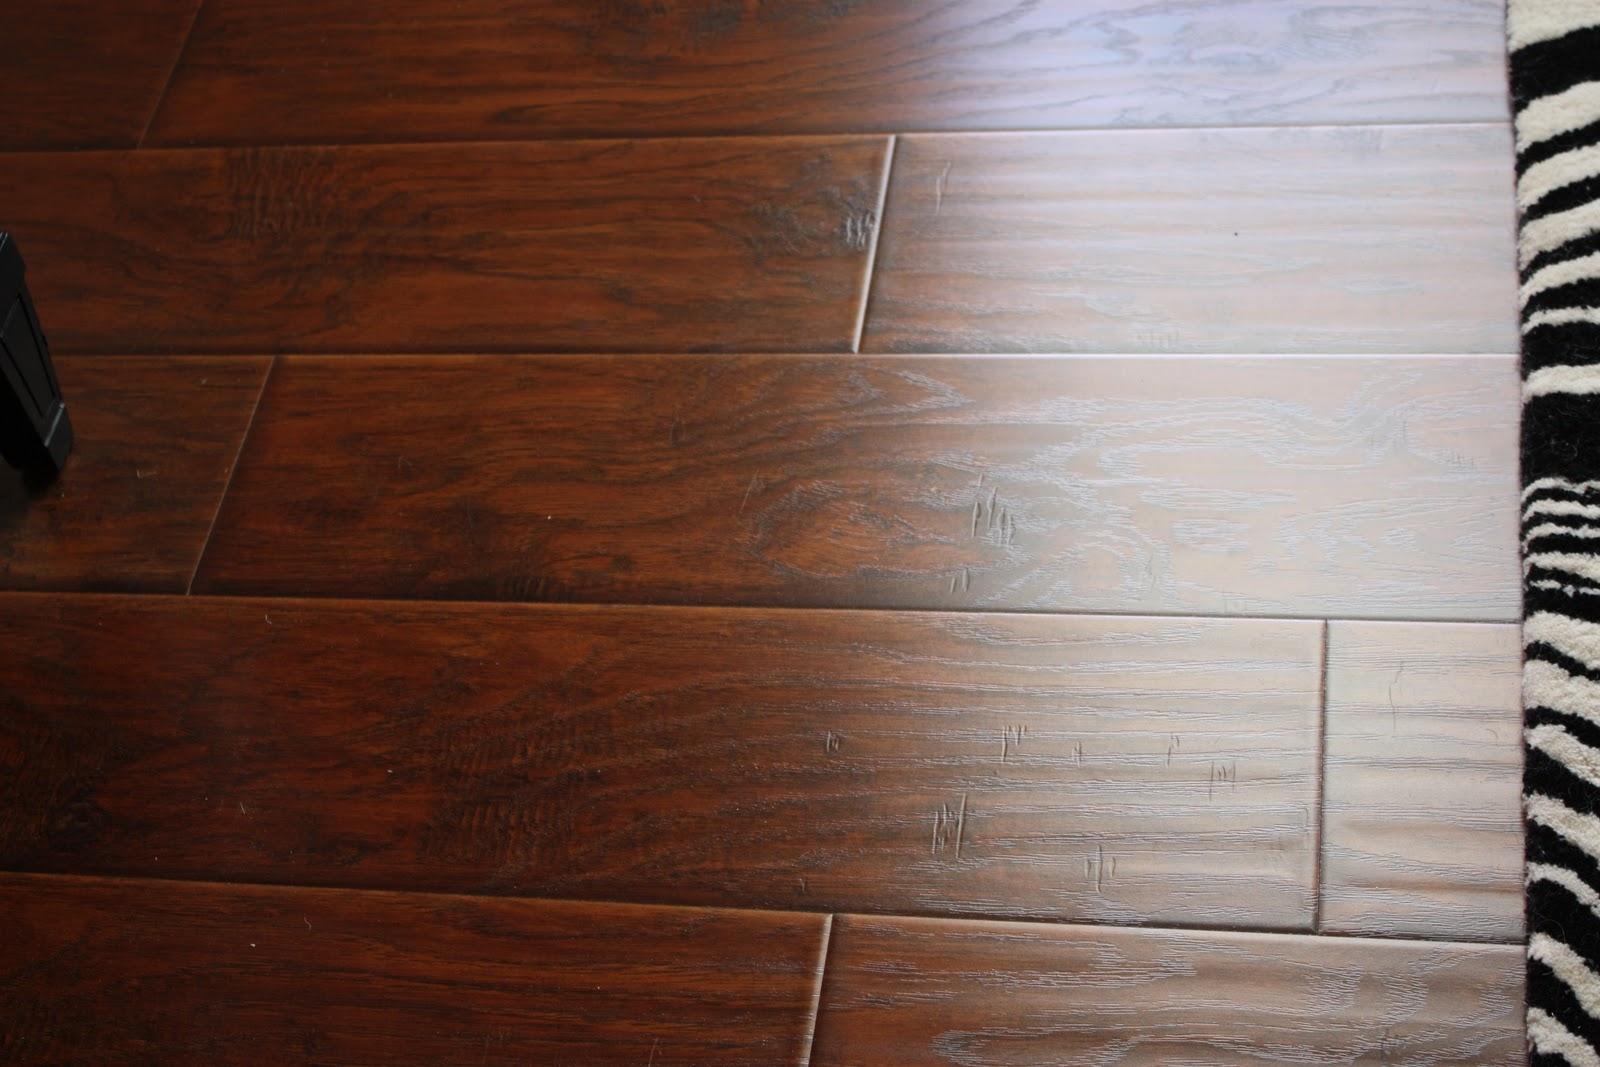 laminate wood flooring ideas adorable design of the brown wooden laminate hardwood flooring as the floor KMLCVJE